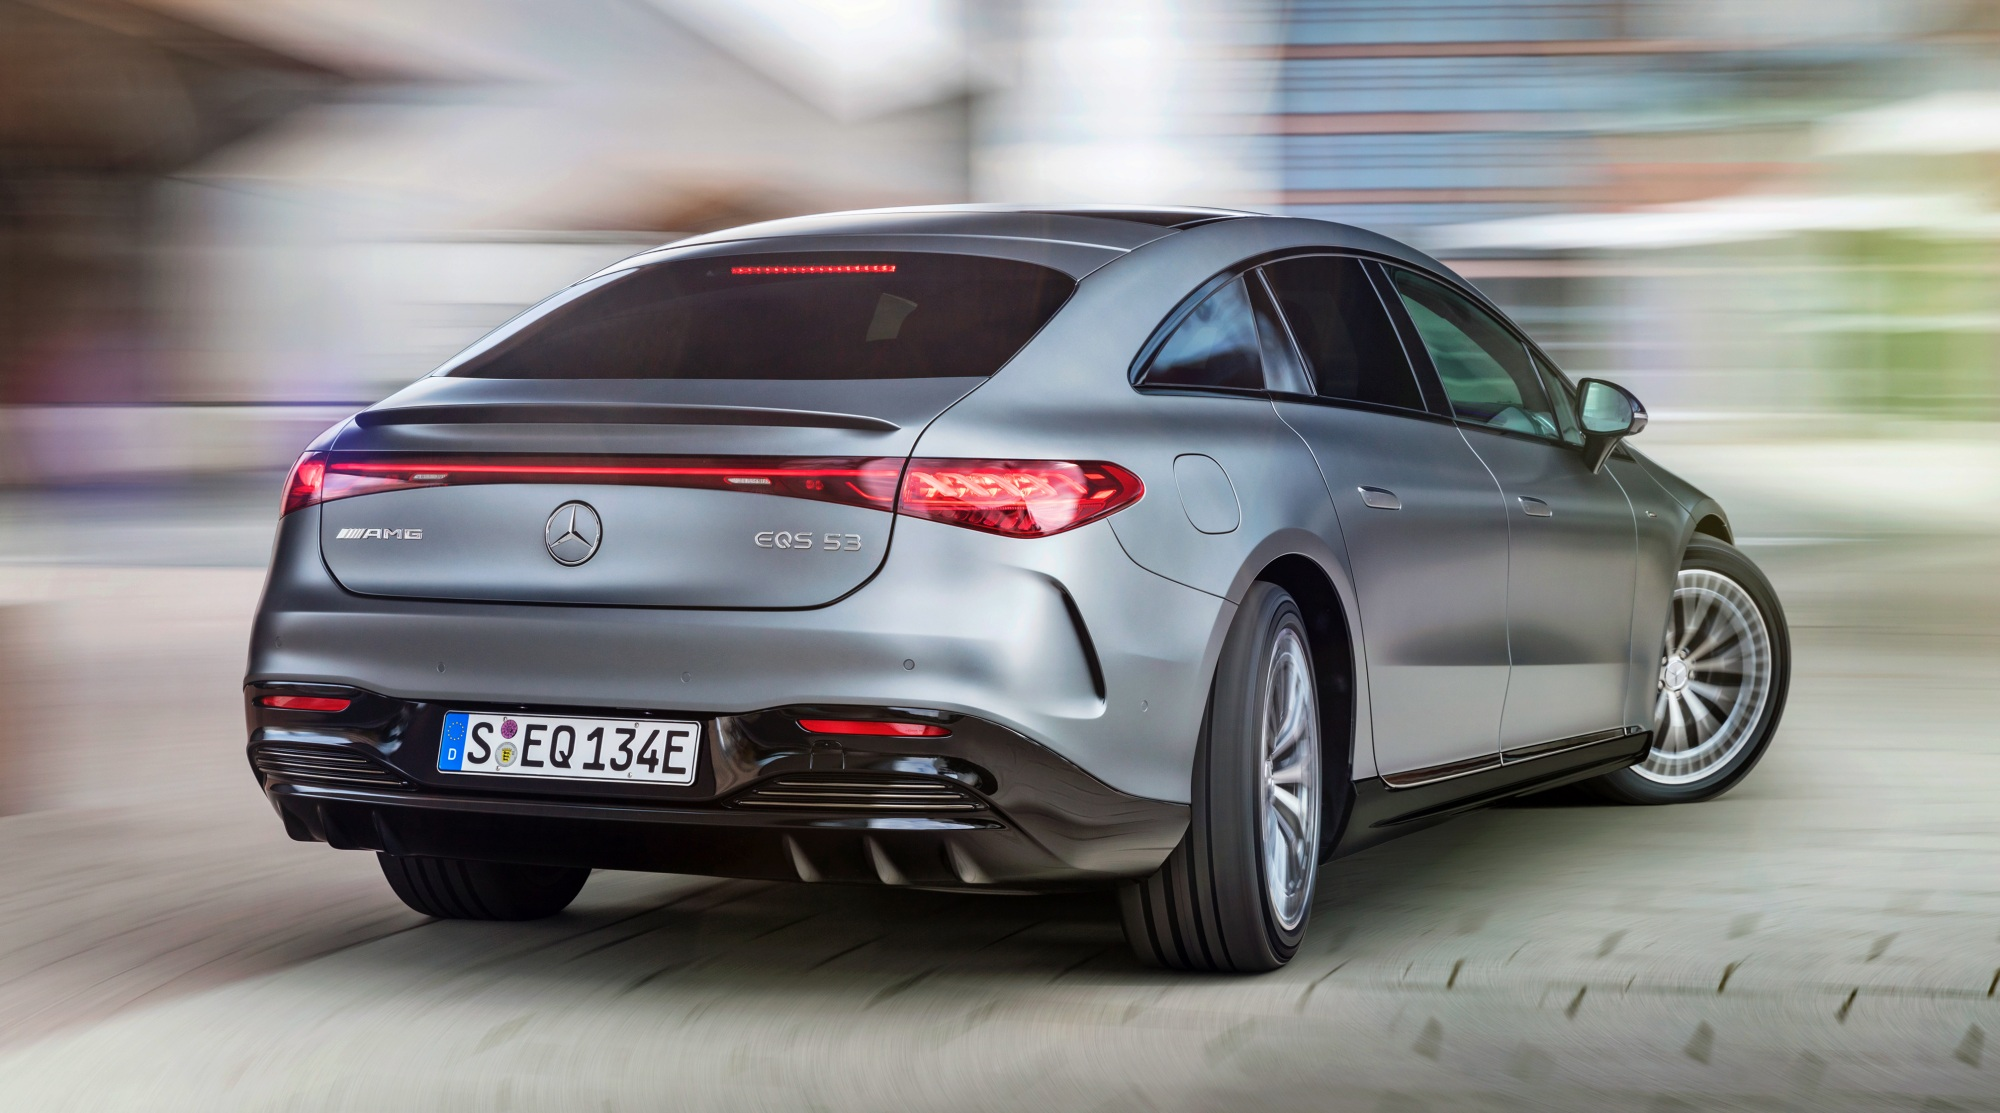 Mercedes-AMG EQS 53 4MATIC+ tył